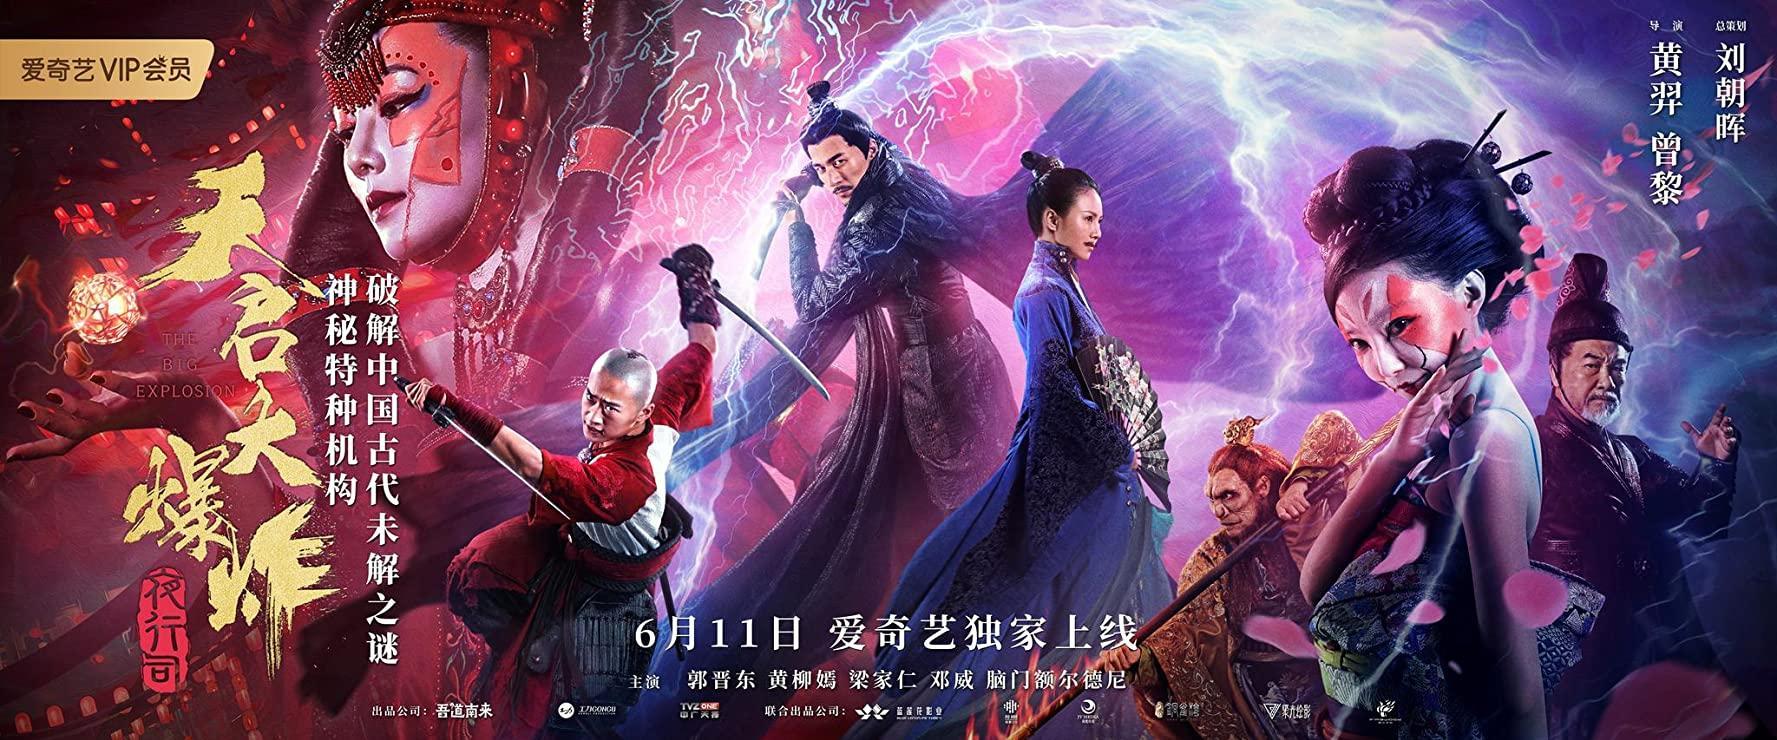 مشاهدة فيلم The Big Explosion (2020) مترجم HD اون لاين